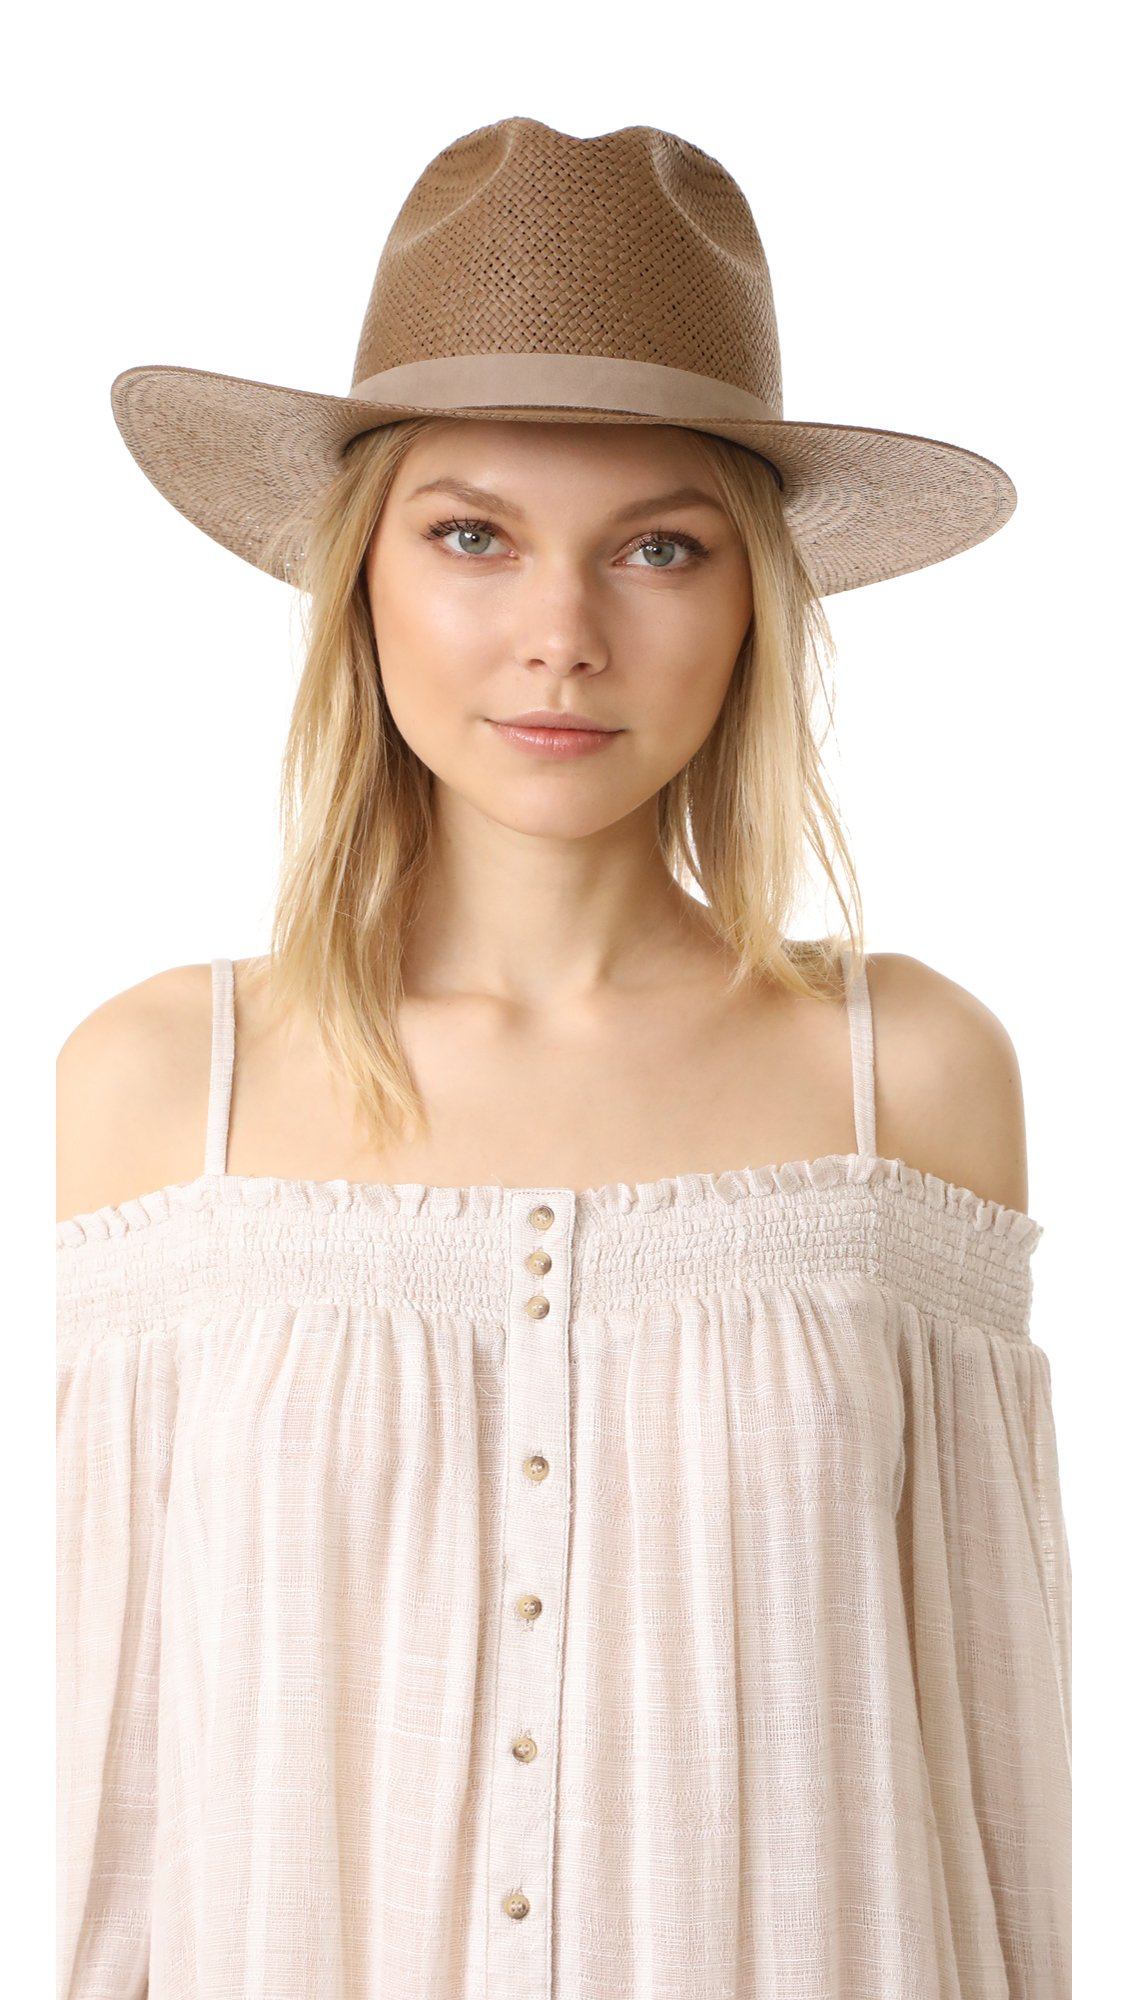 Janessa Leone Women's Packable Adriana Short Brimmed Fedora, Brown, Medium